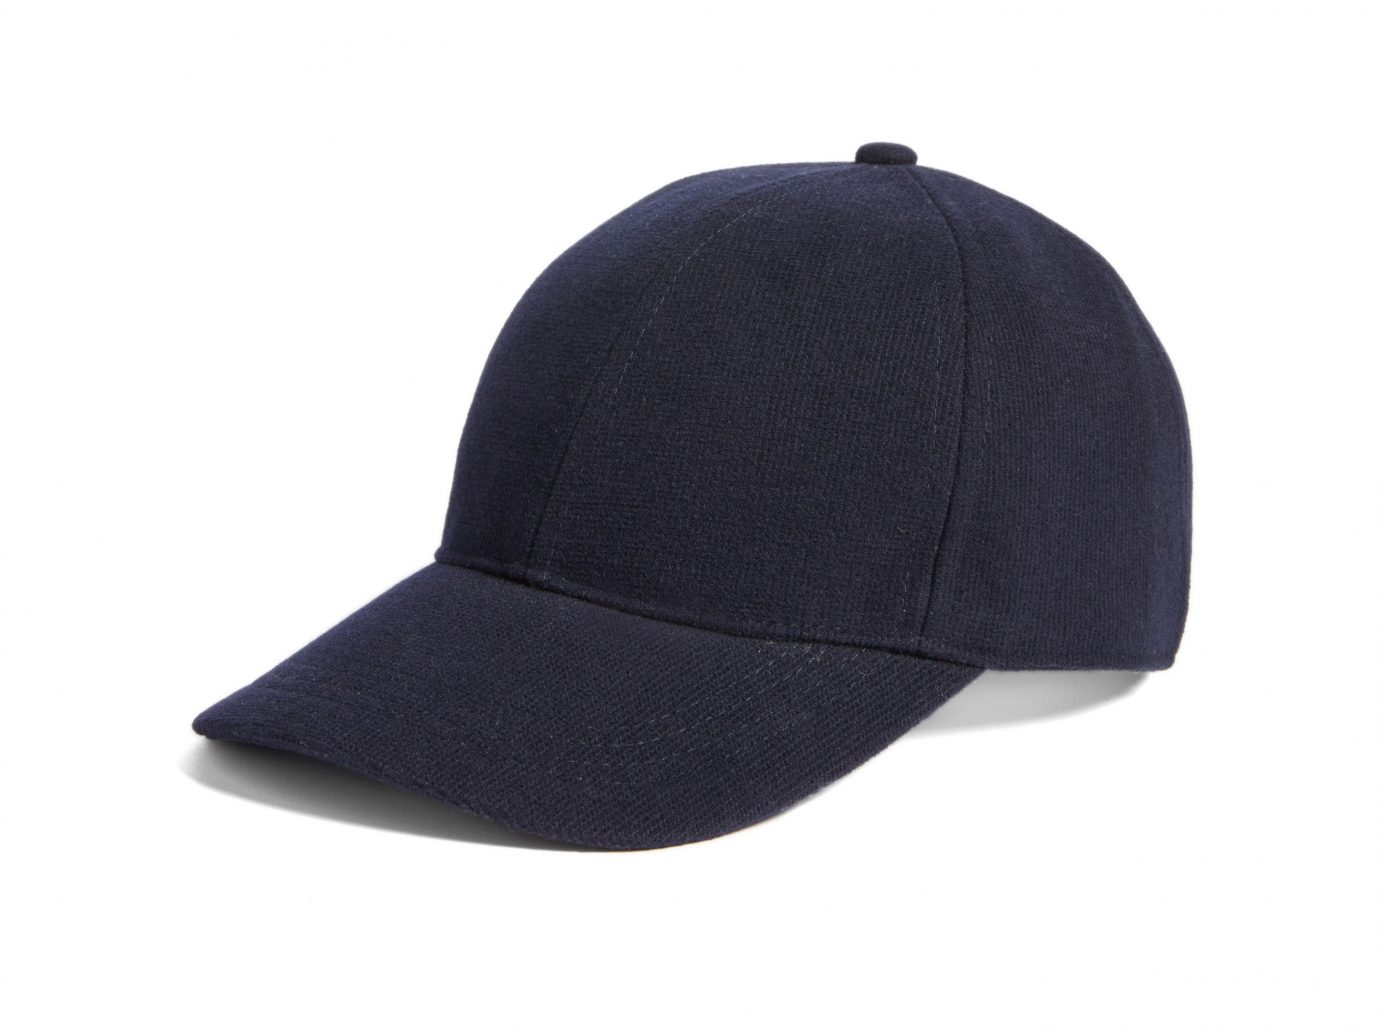 Fall Travel Style + Design Travel Shop Weekend Getaways clothing hat headdress cap headgear baseball cap product product design